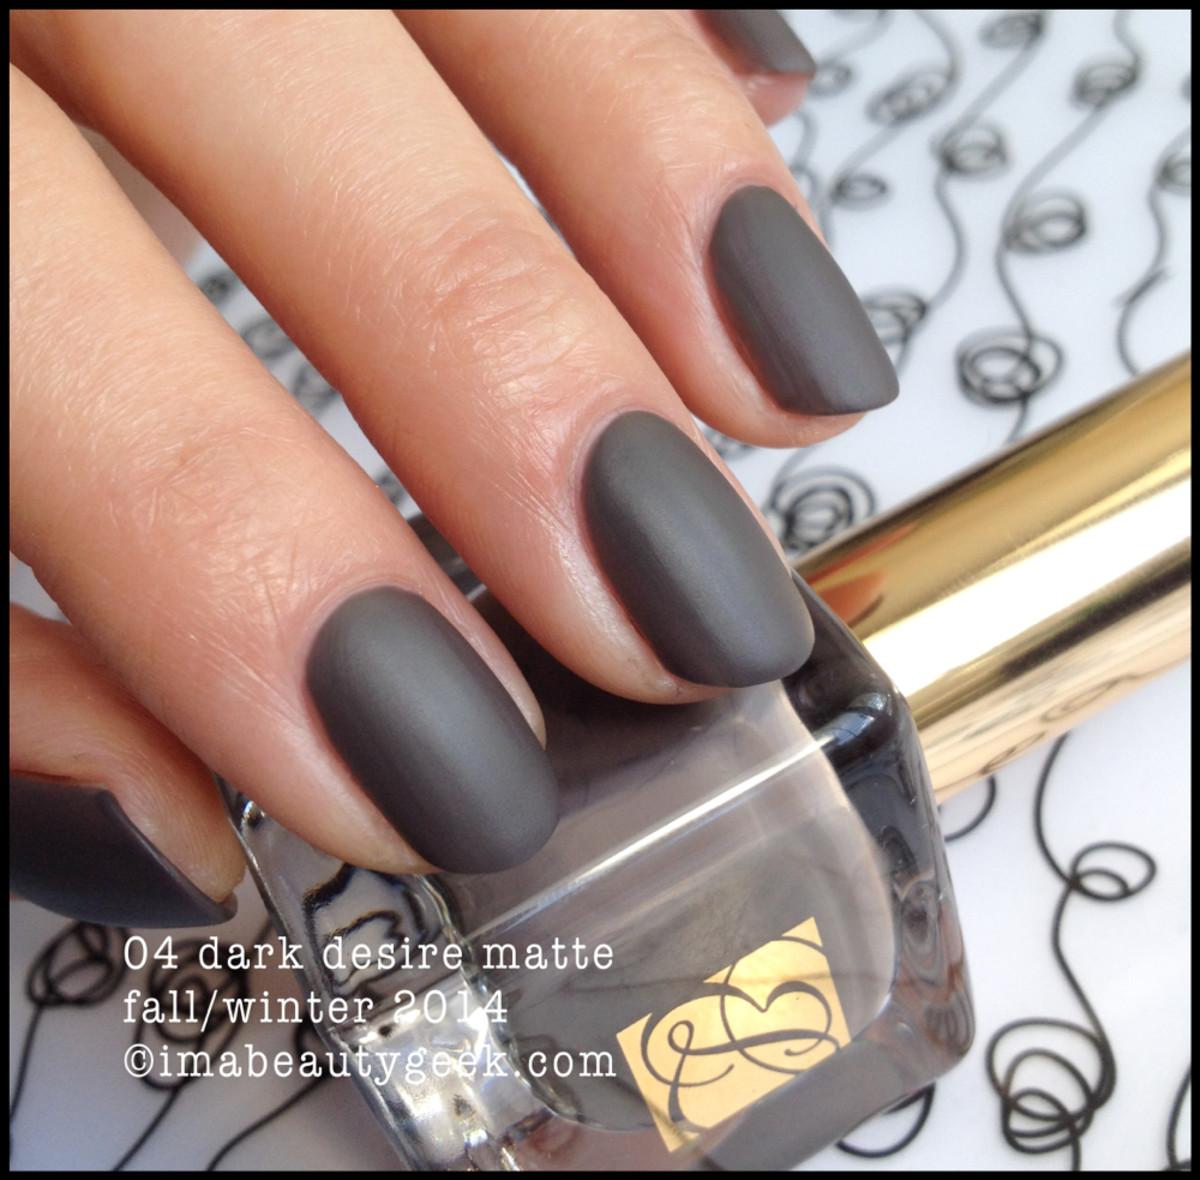 Estee Lauder Dark Desire Matte fall 2014